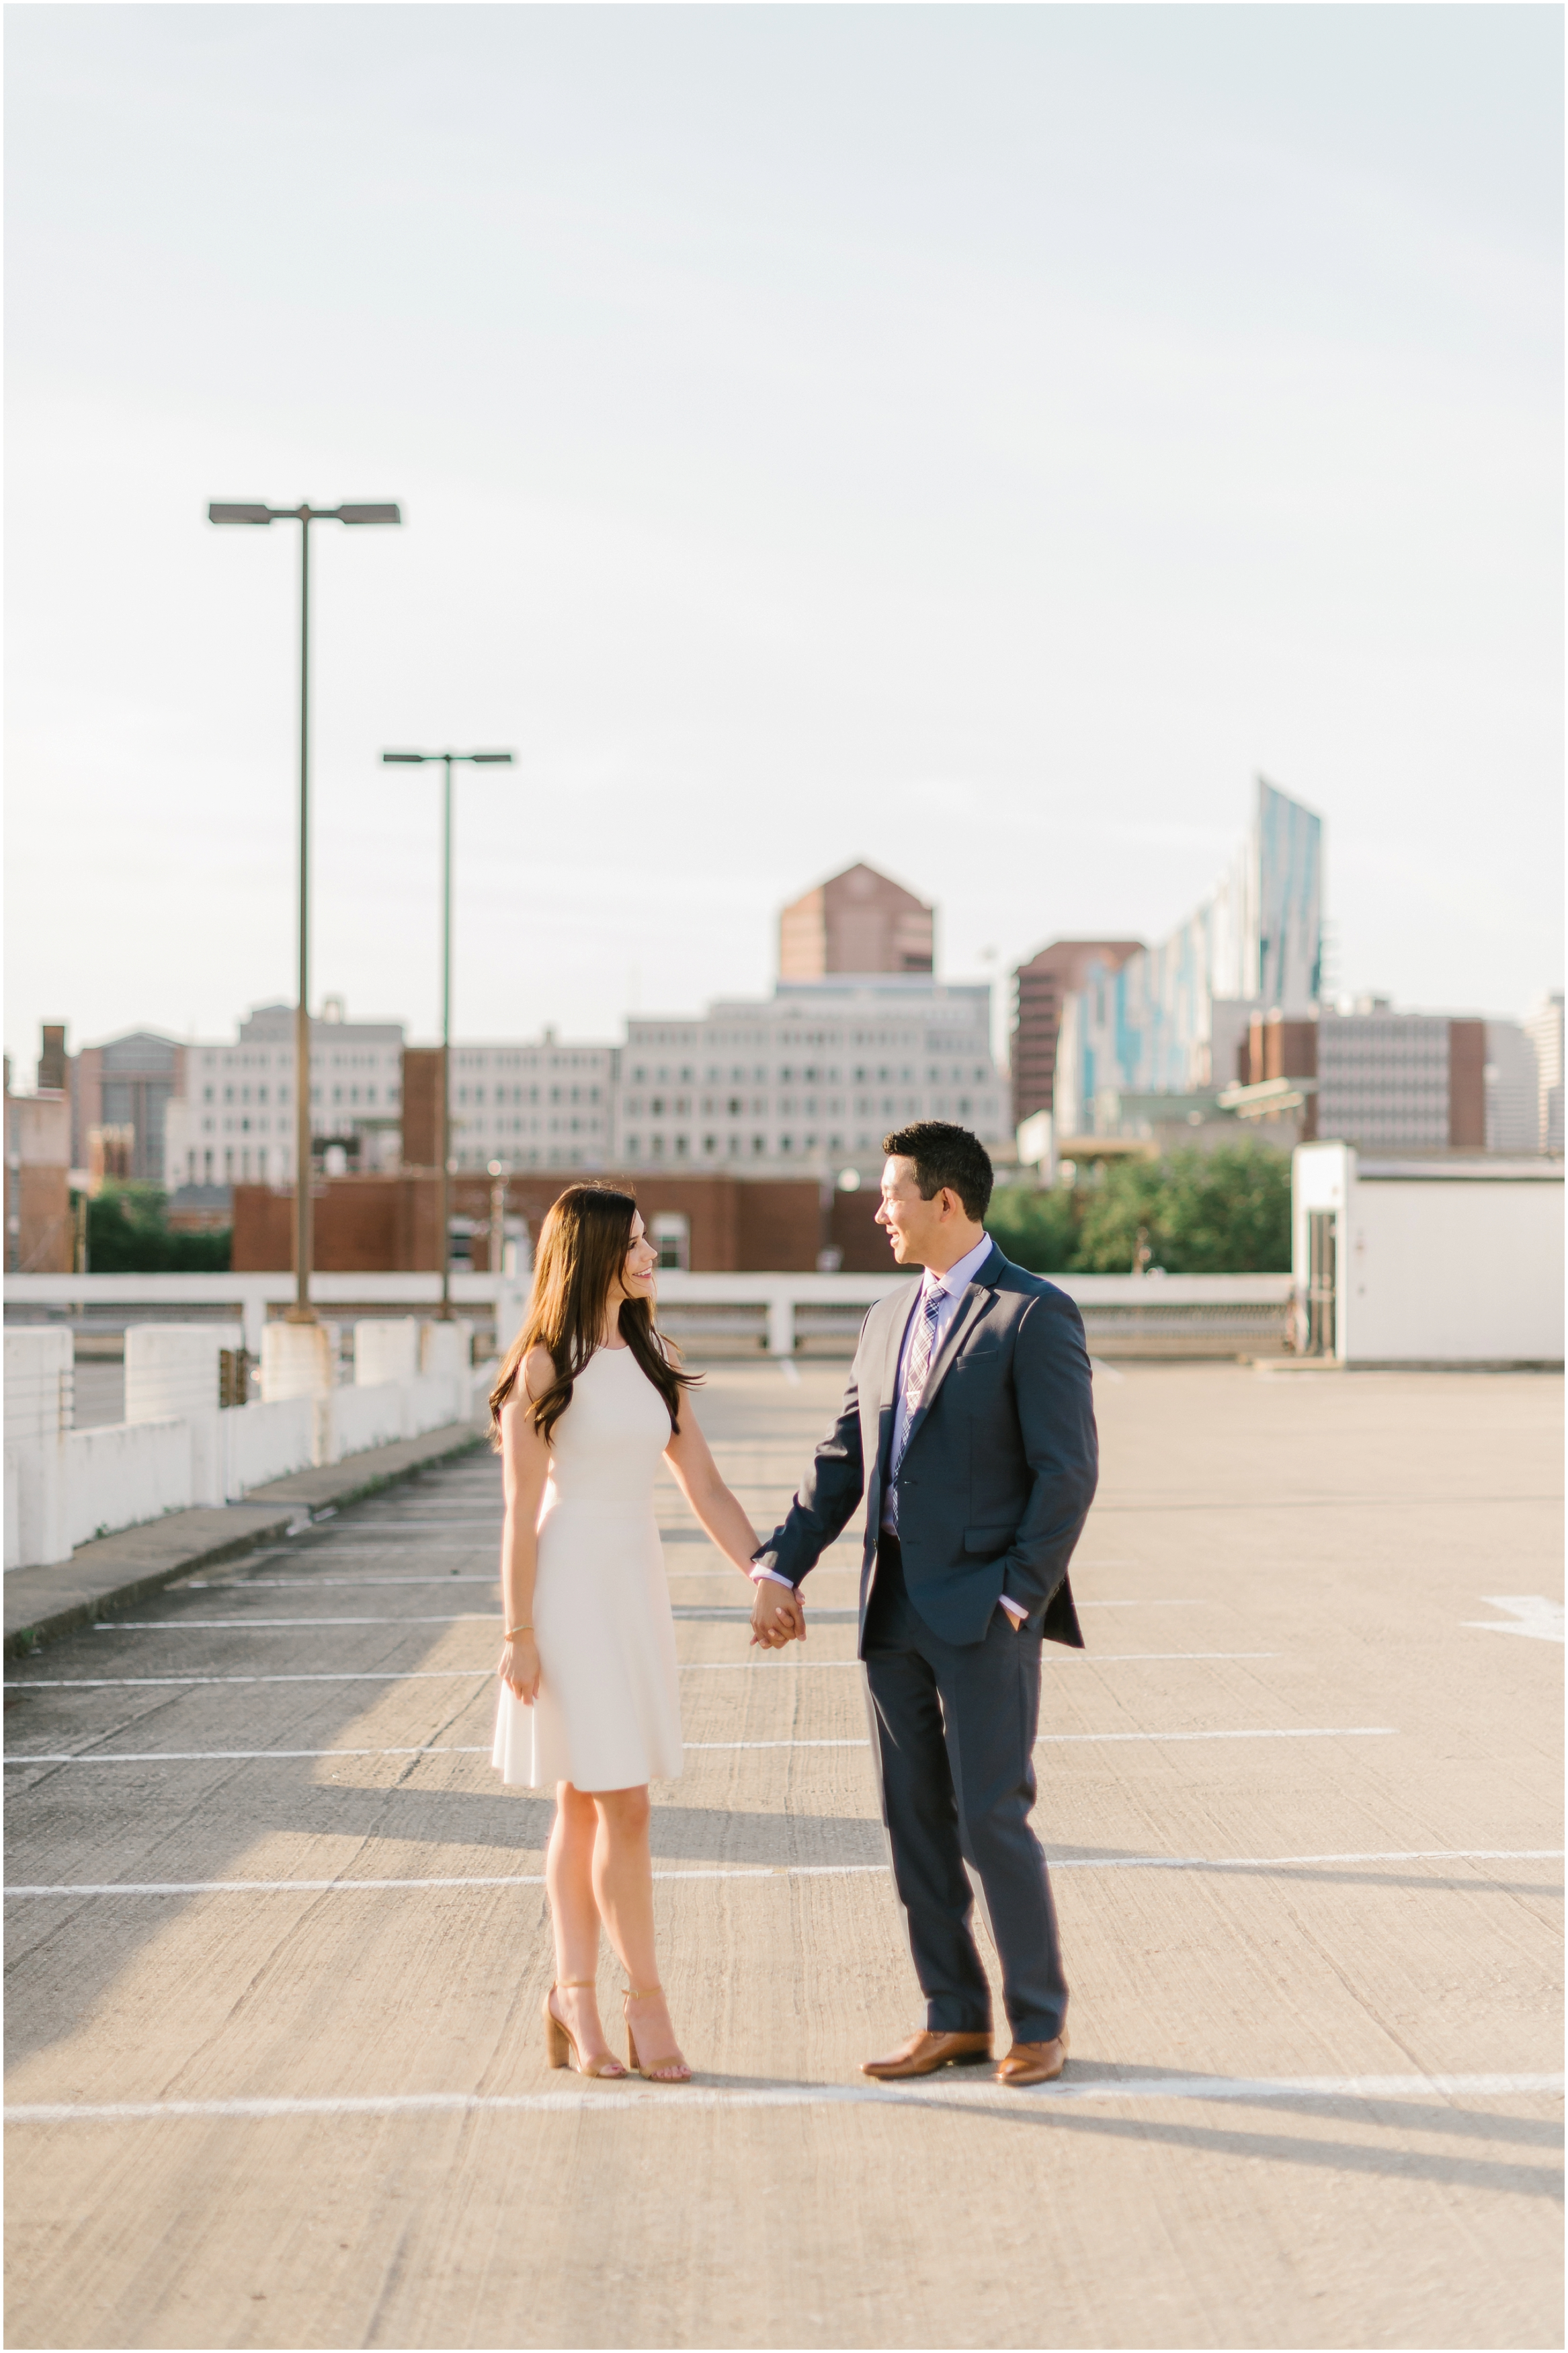 Rebecca_Shehorn_Photography_Indianapolis_Wedding_Photographer_8478.jpg